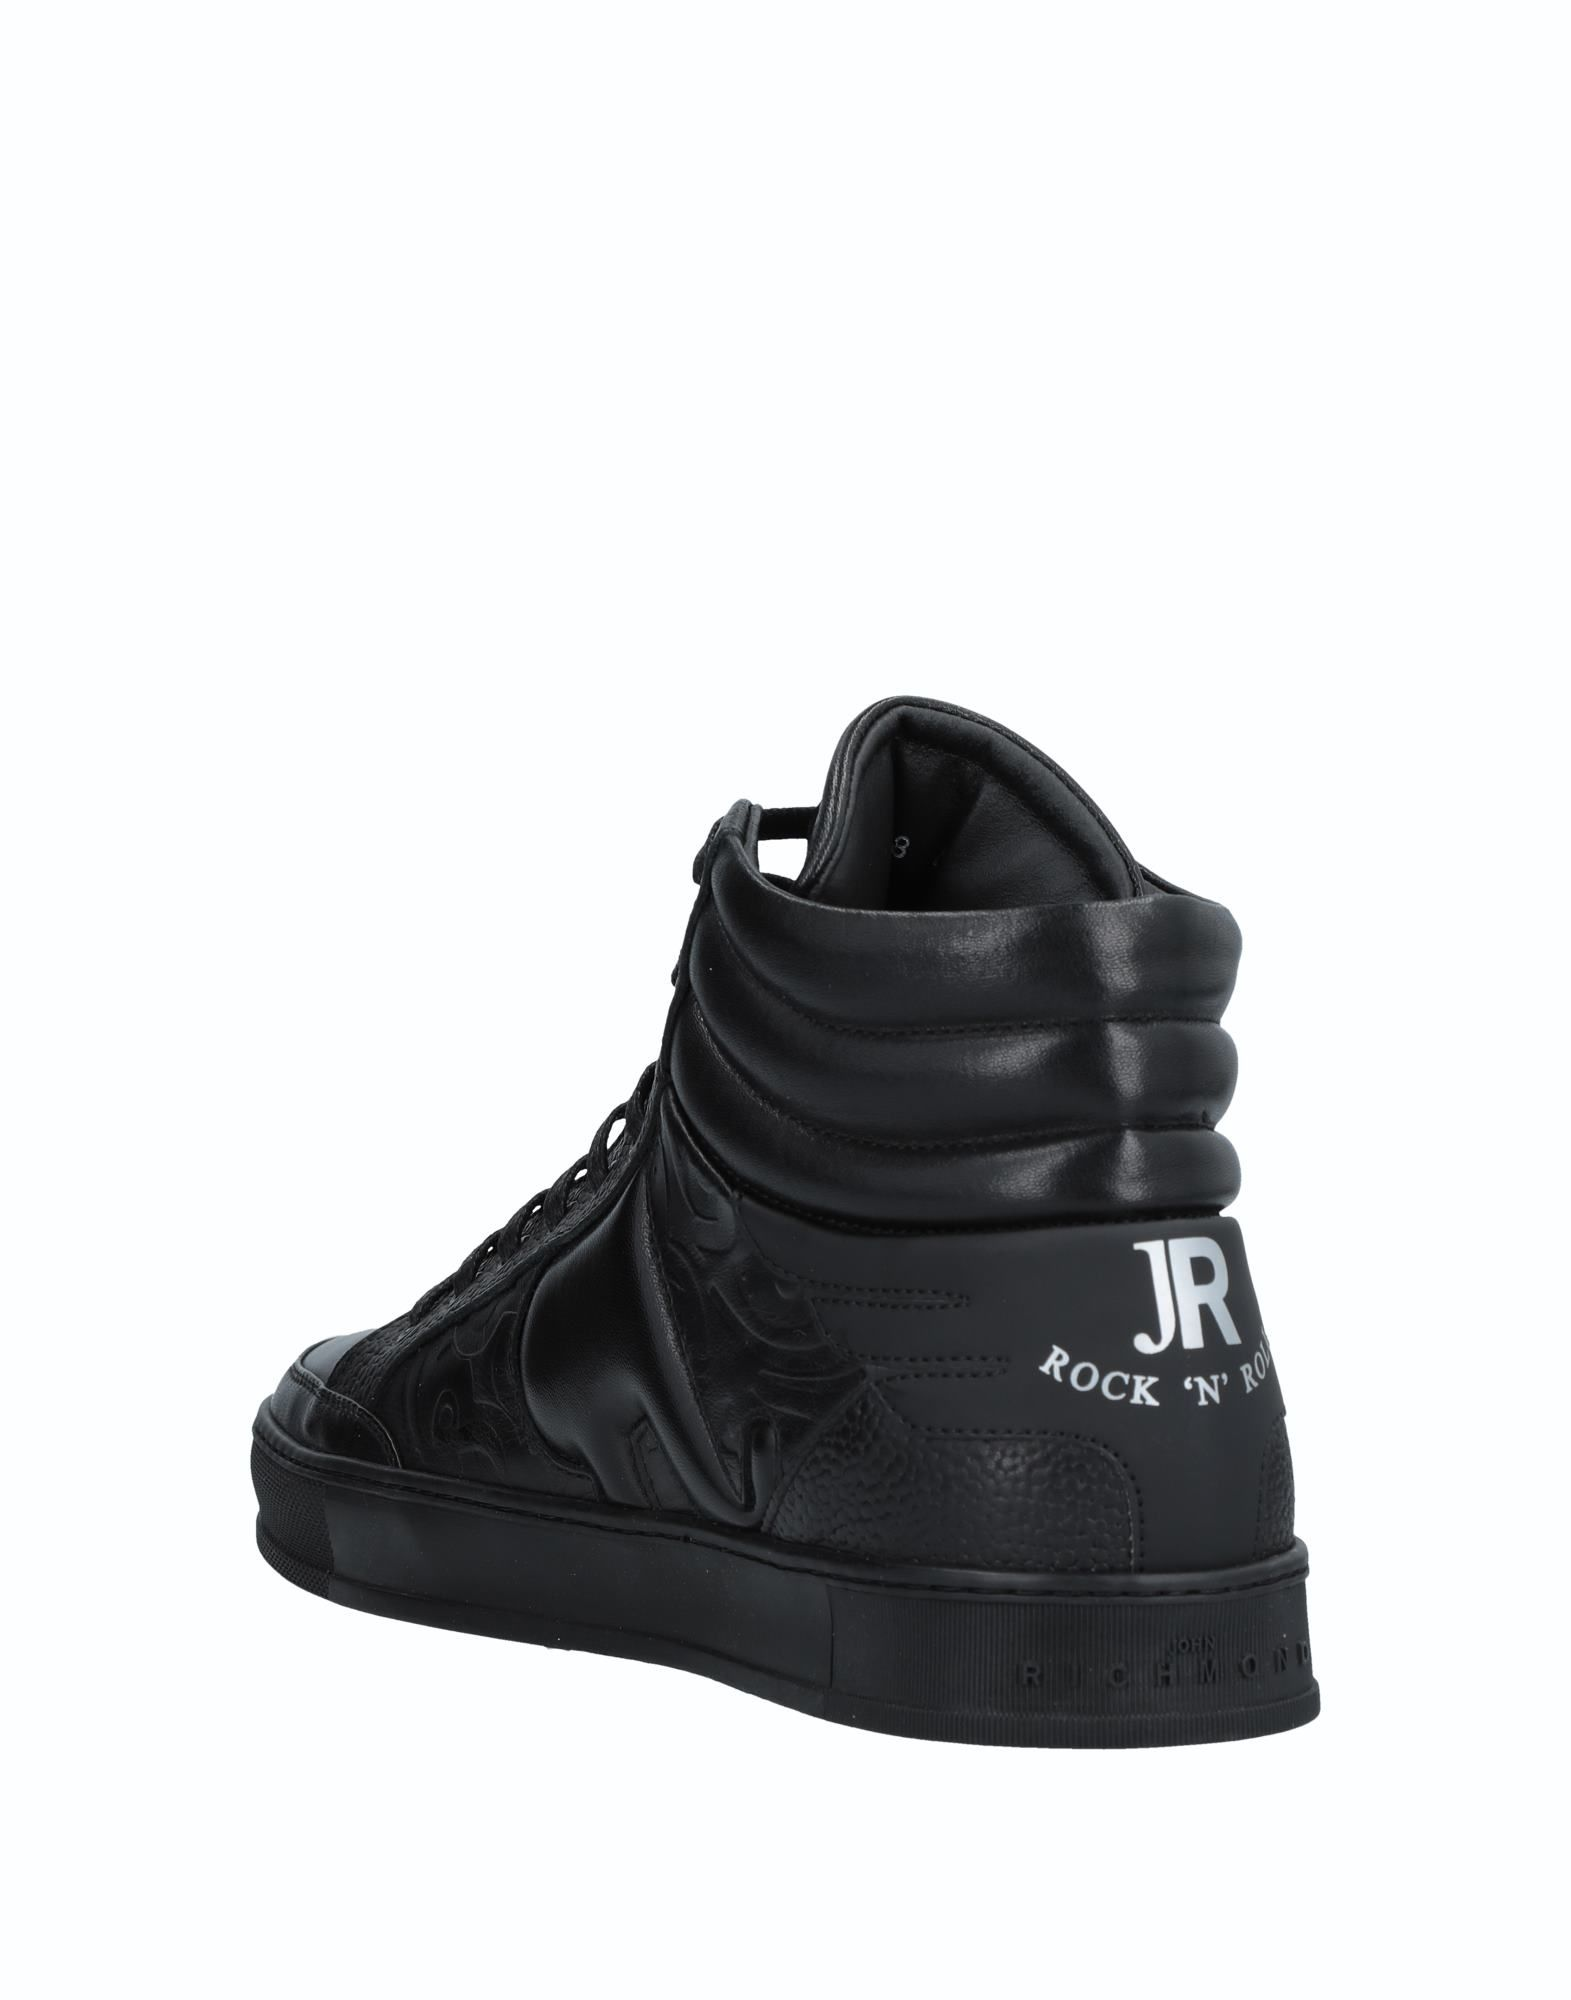 John Richmond Sneakers Herren  11538097EX Gute Qualität beliebte Schuhe